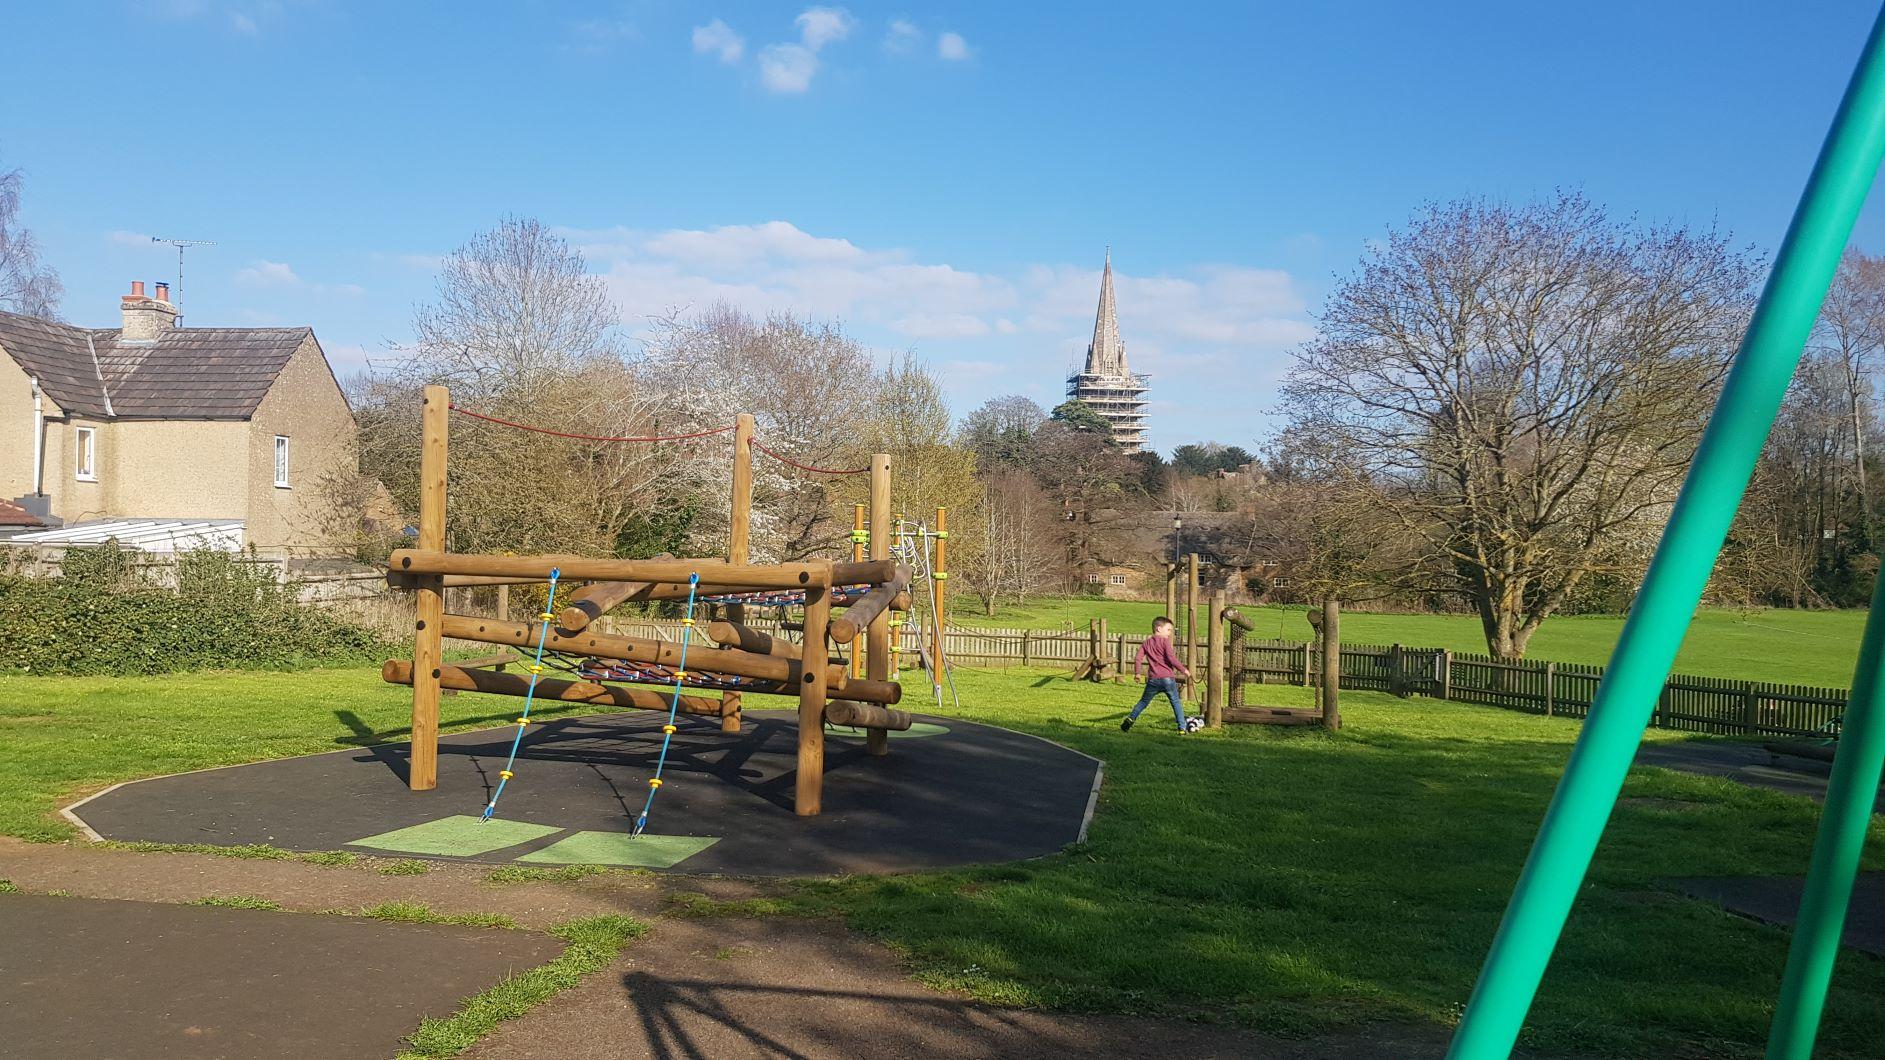 Adderbury Play Park